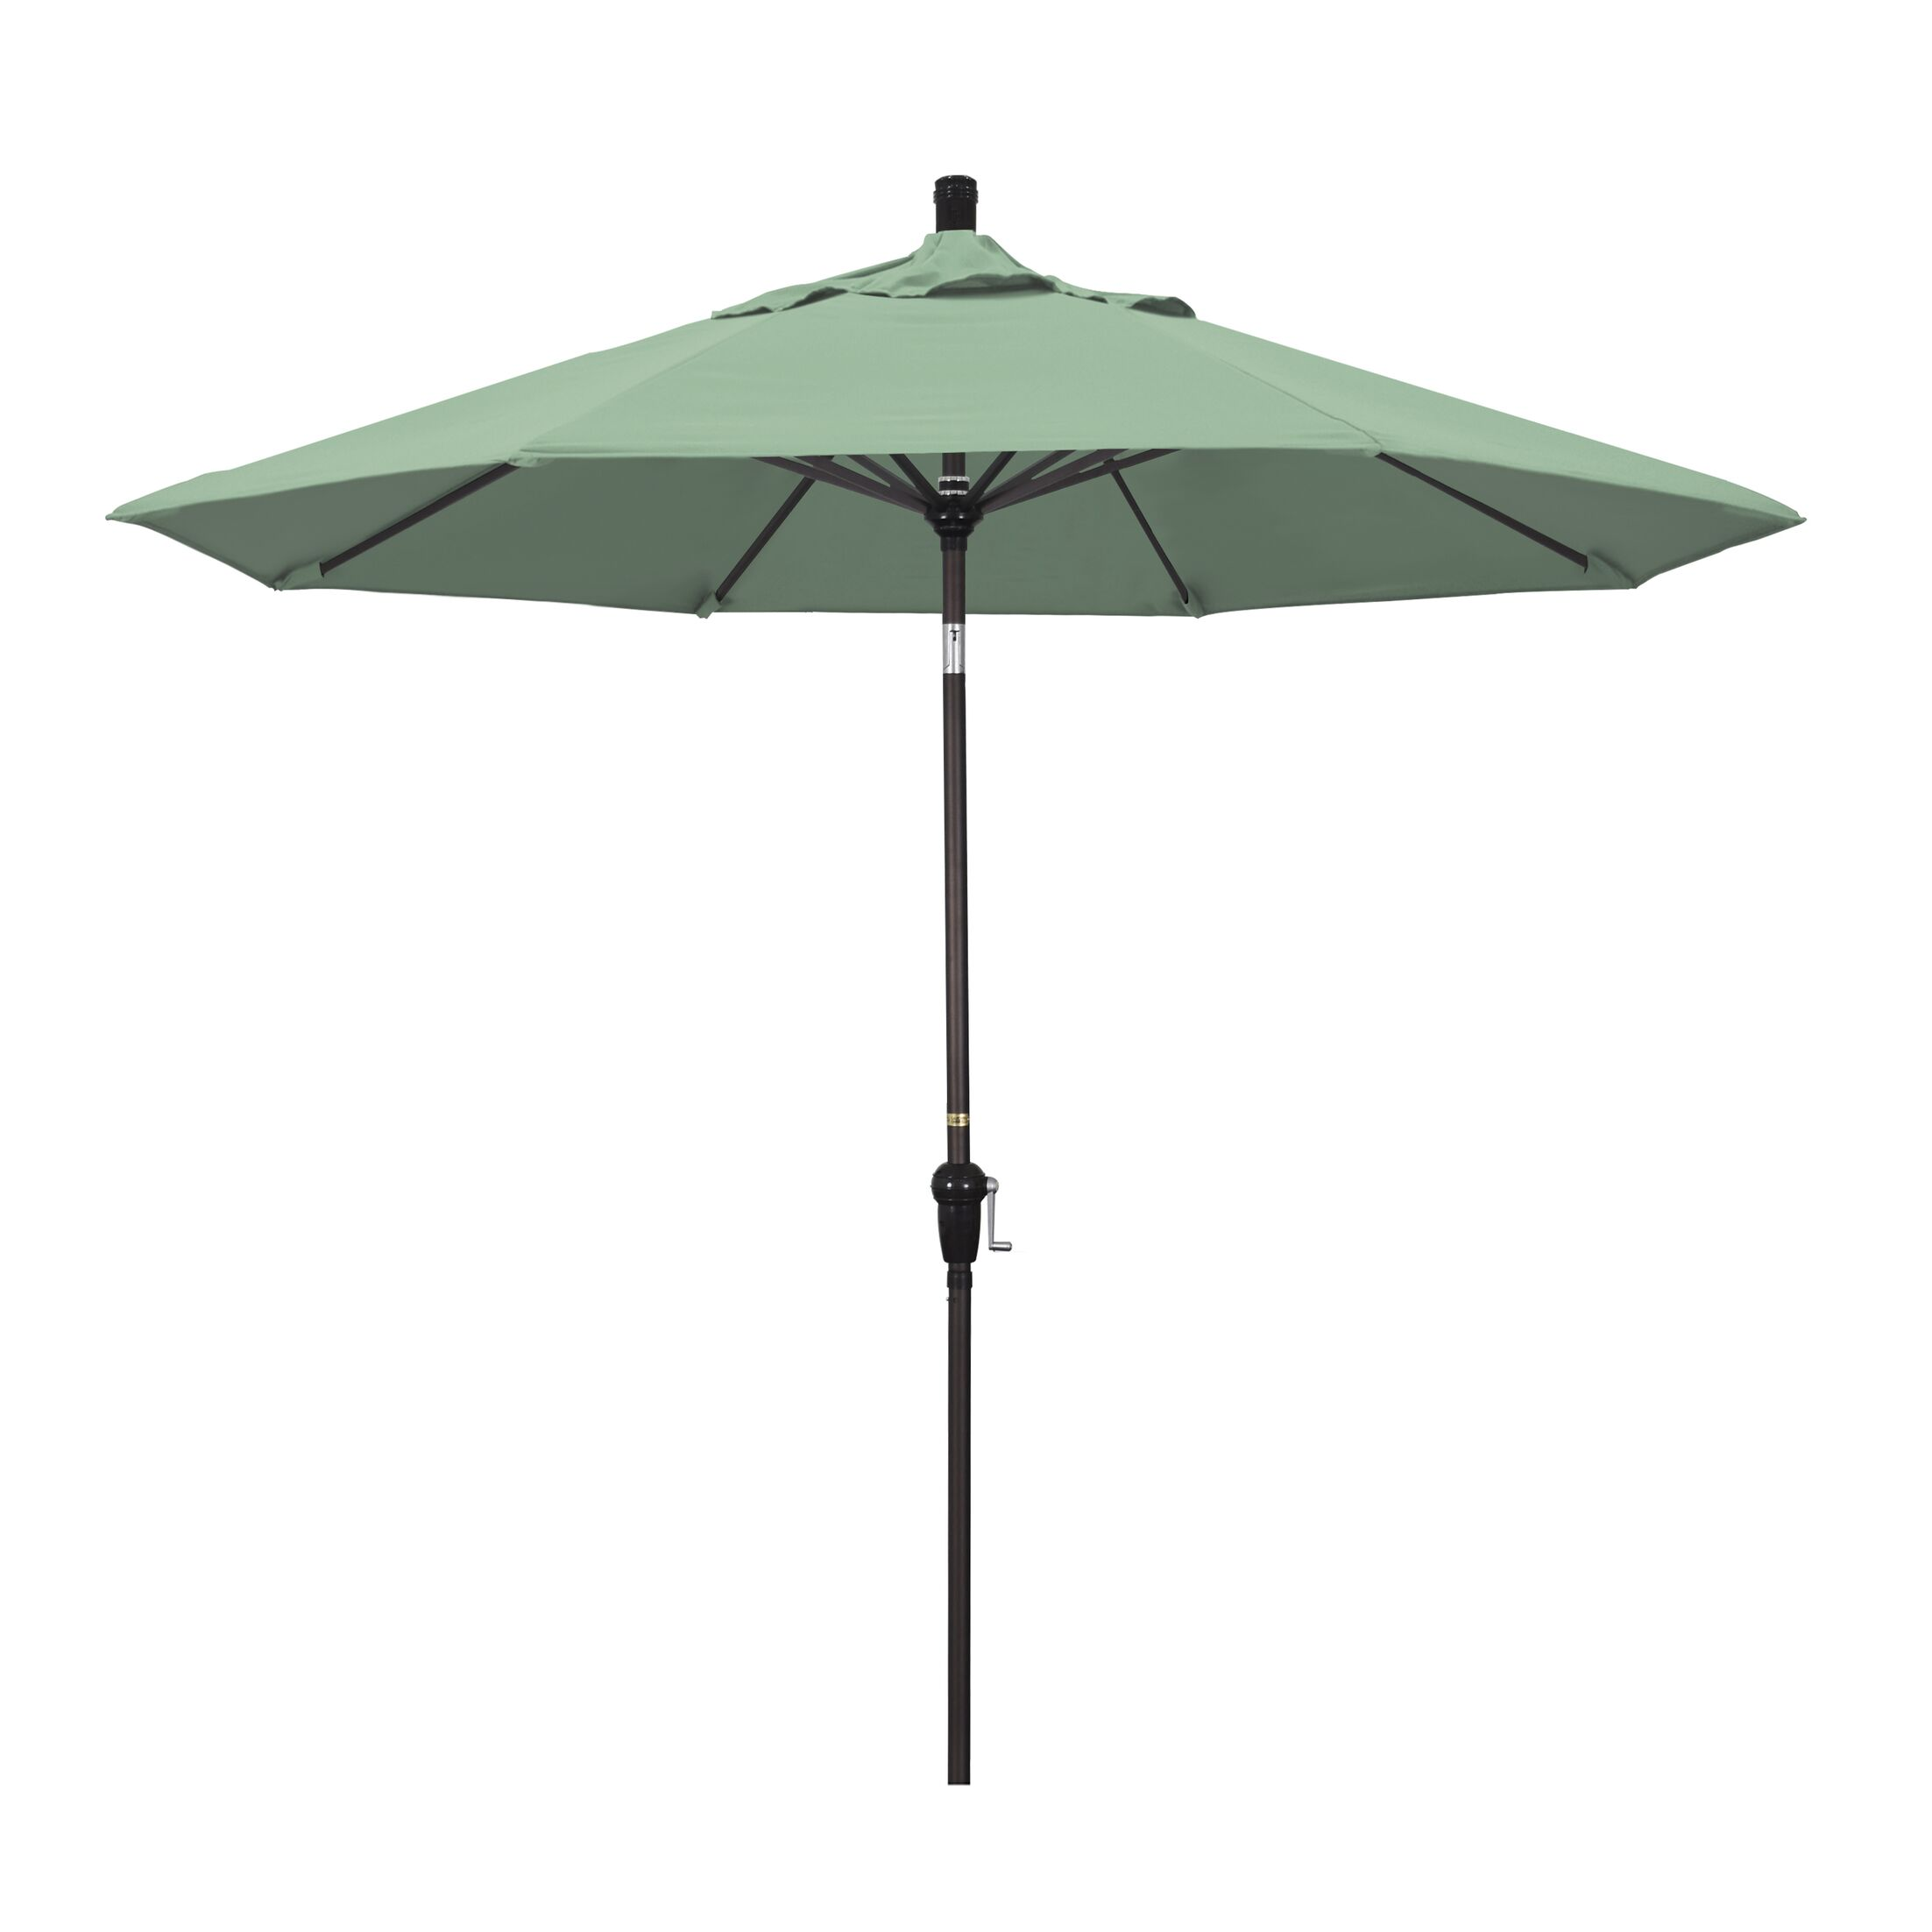 Mullaney 9' Market Umbrella Fabric: Spa, Frame Color: Bronze